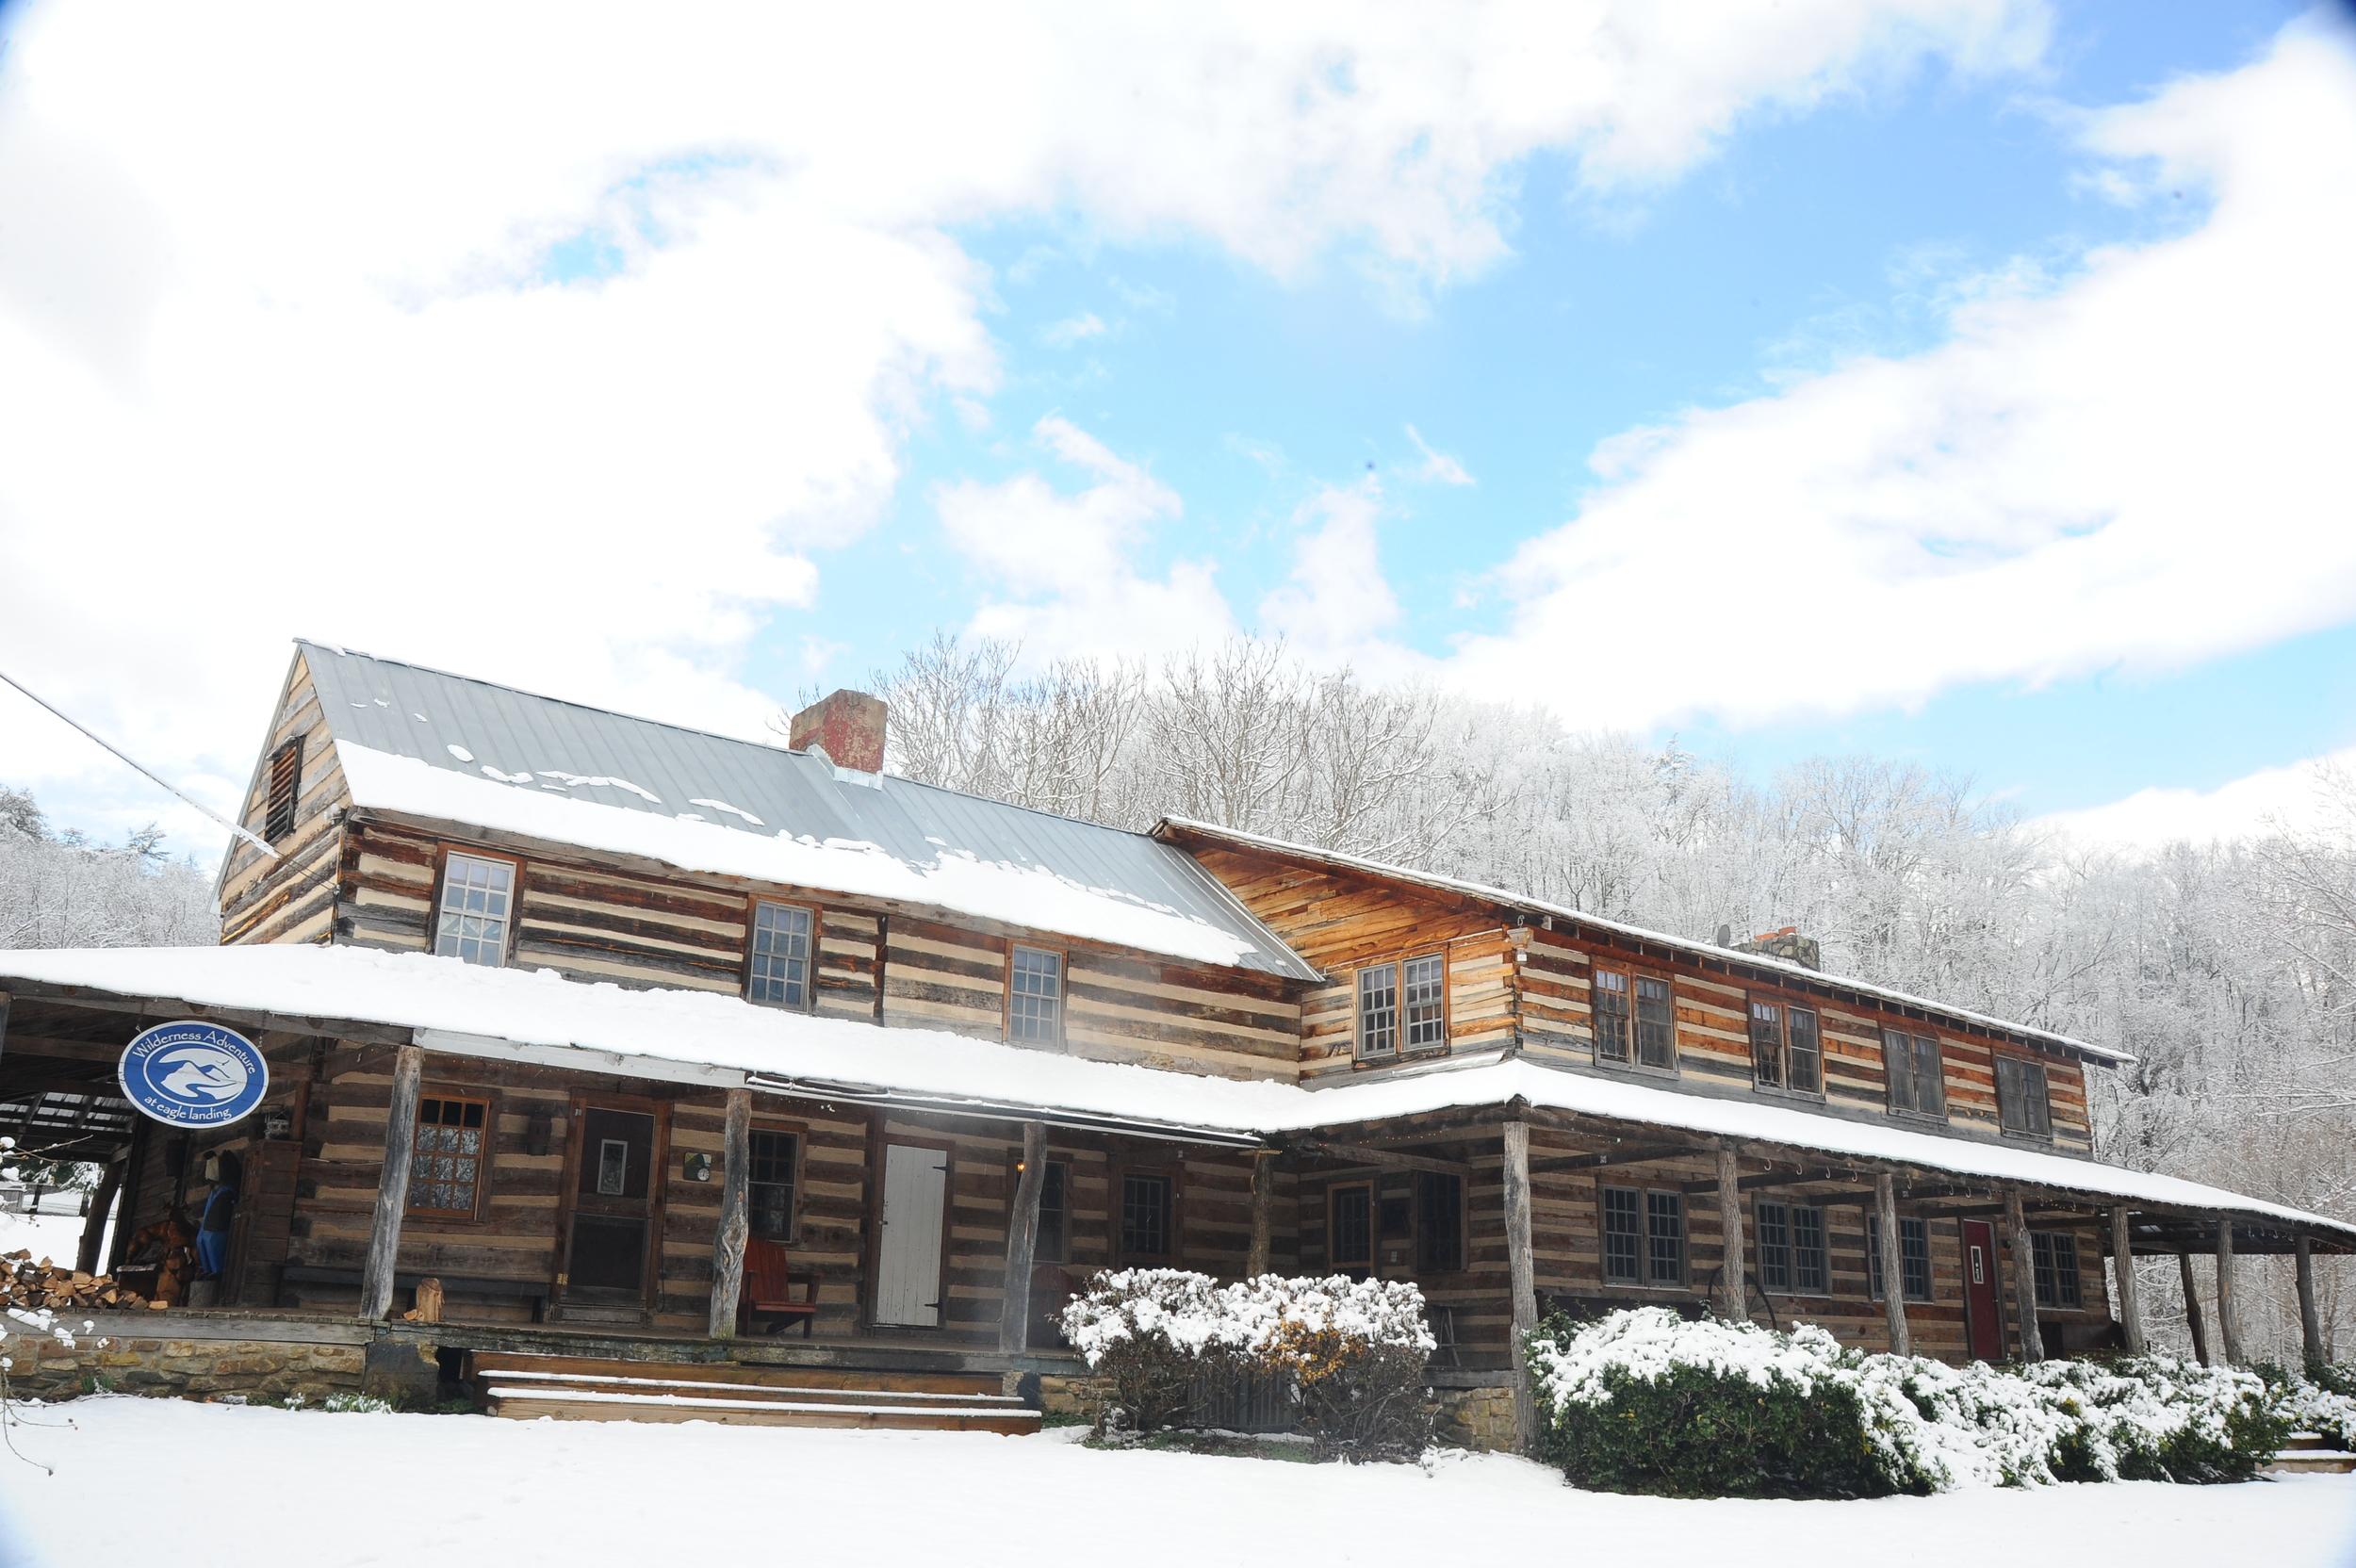 Wilderness Adventure's centerpiece, the Main Lodge